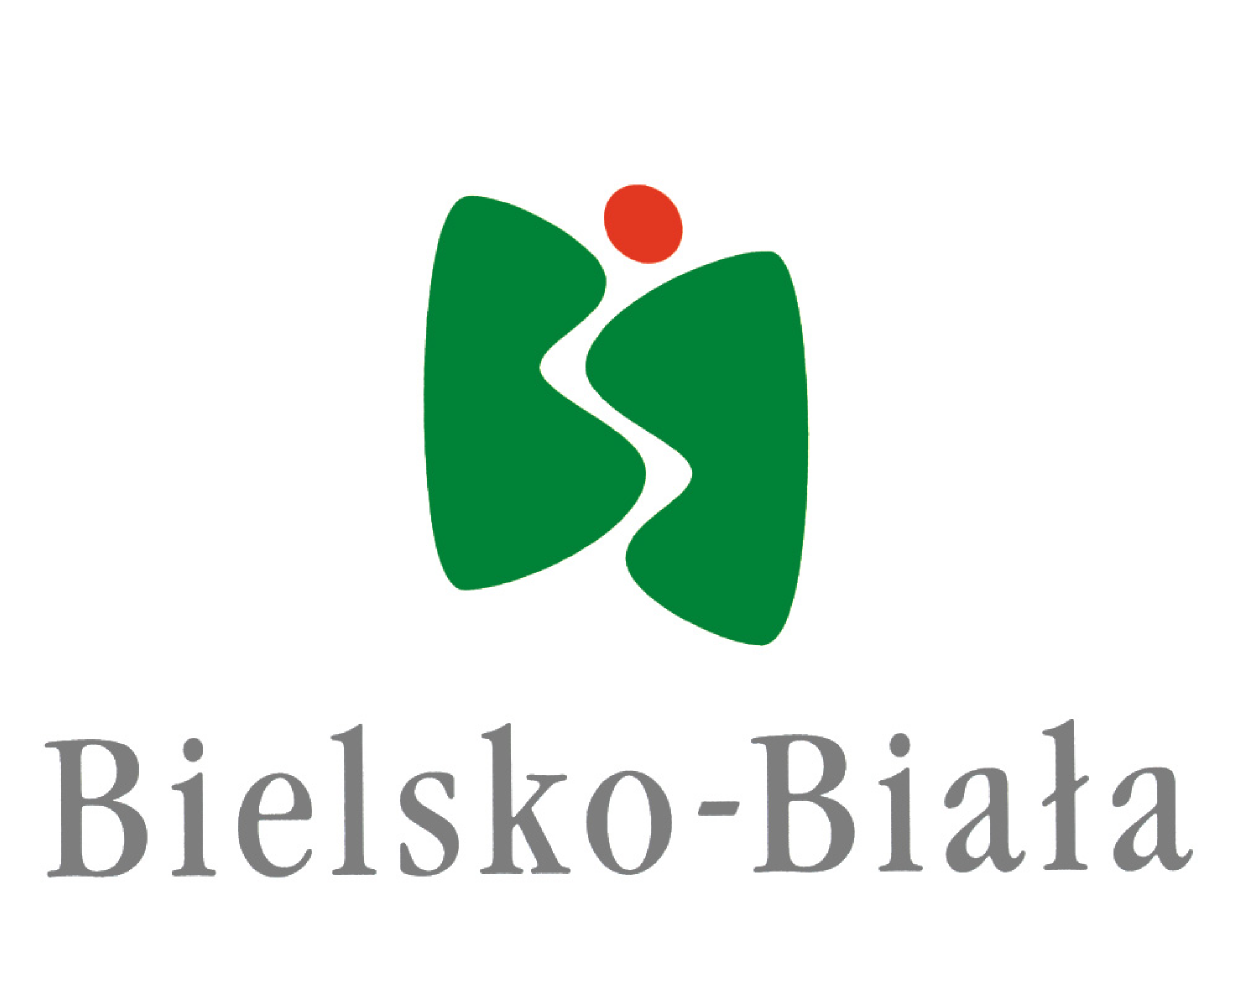 Bielsko-Biała.logo_2